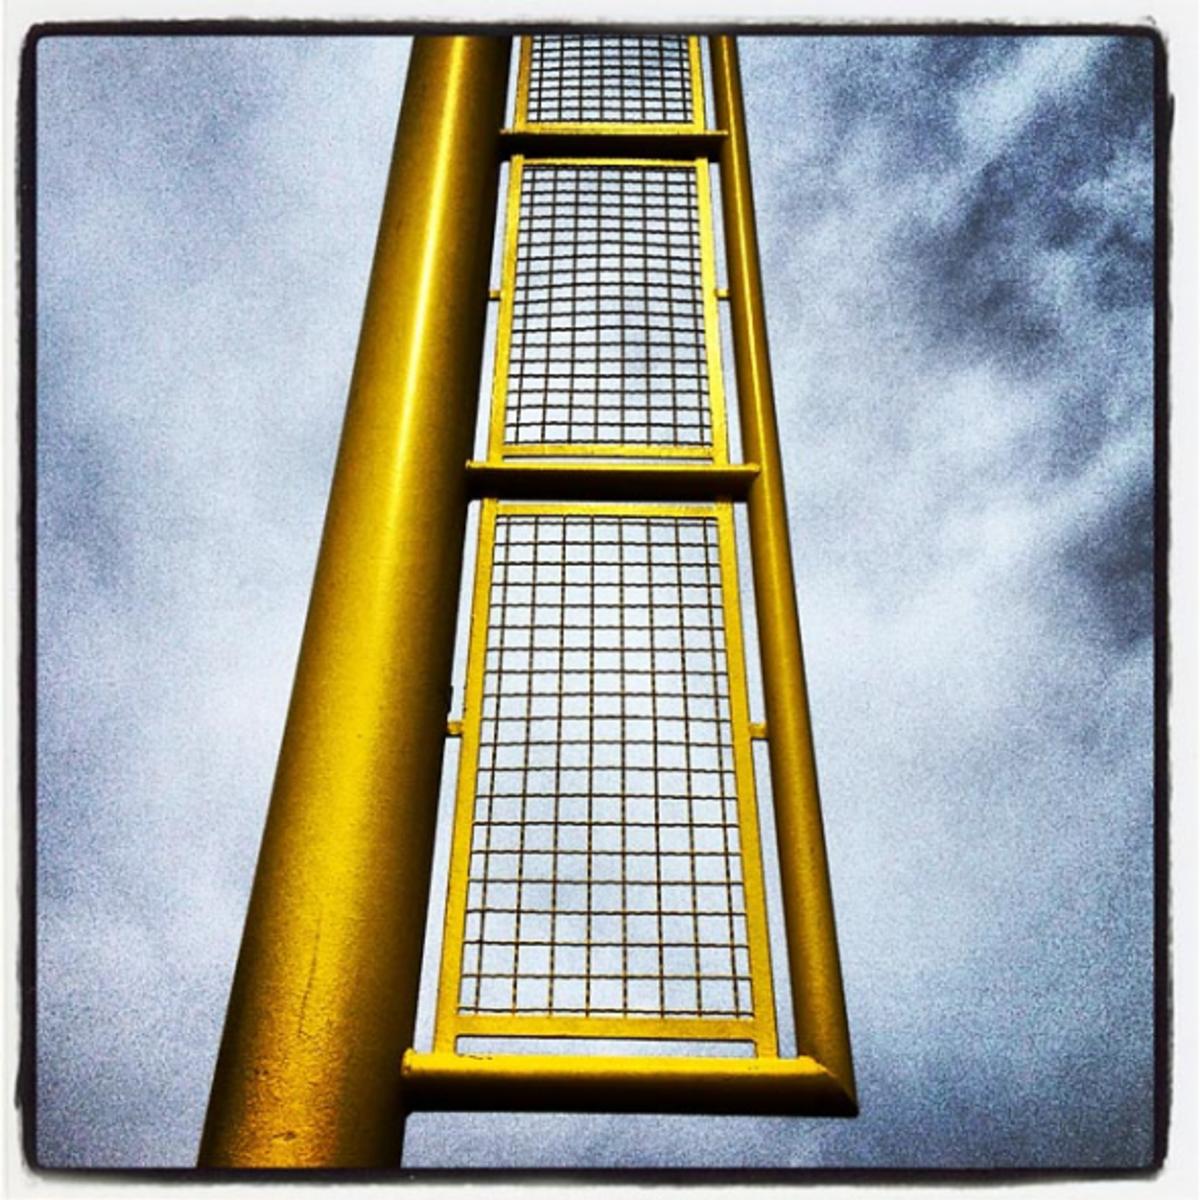 Brad Mangin on Instagram